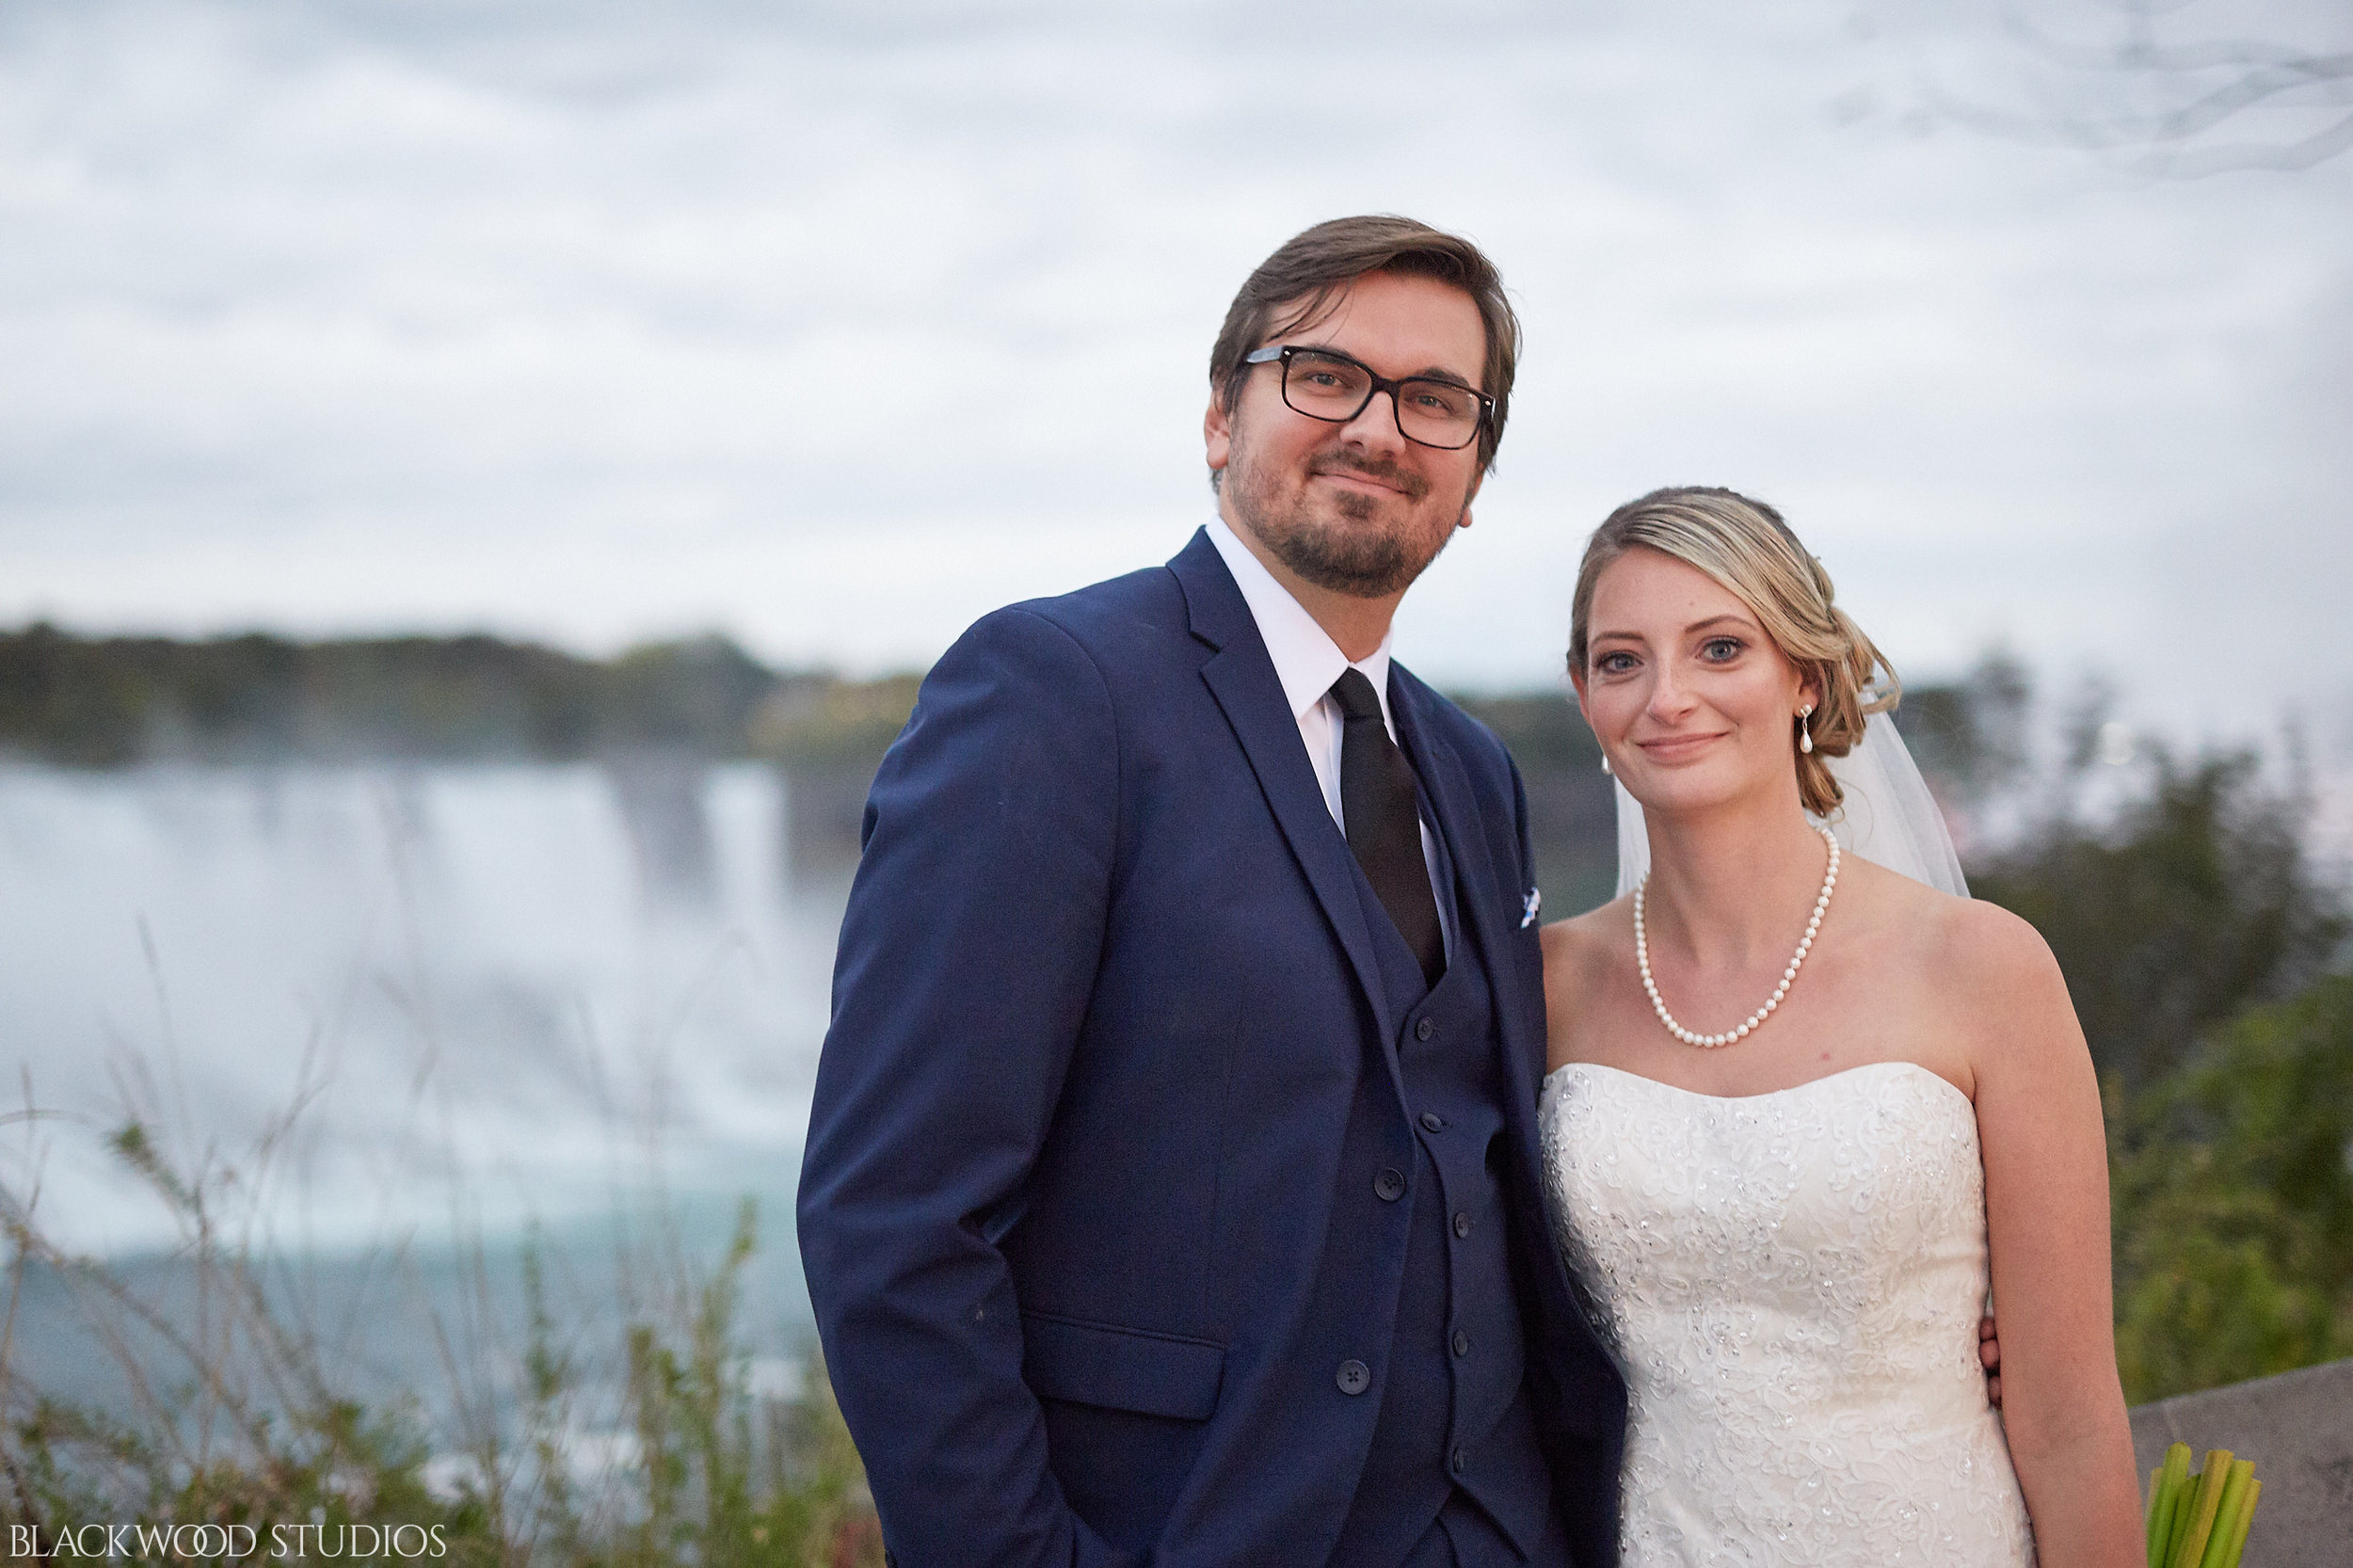 Blackwood-Studios-Wedding-Photography-20170928-191041-Marek-Katie-Michalek-Oakes-Garden-Theatre-Niagara-Falls-Ontario-Canada.jpg